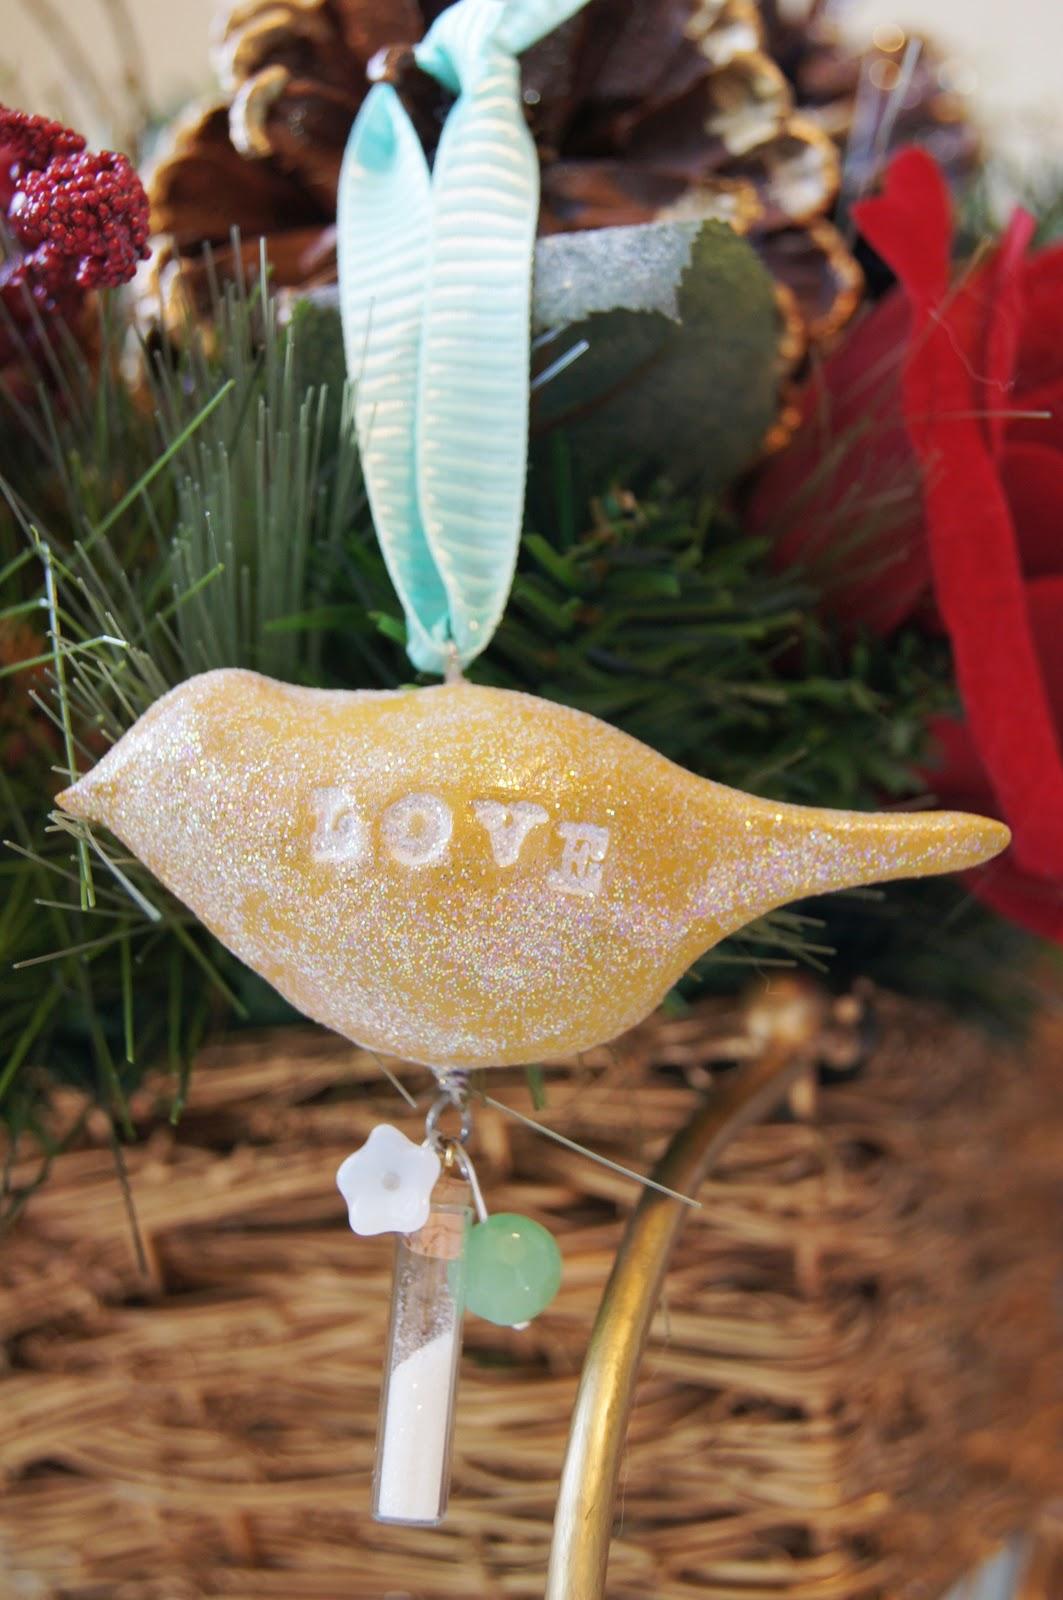 Handmade Holiday: Clay Bird Ornaments | The Shine Project